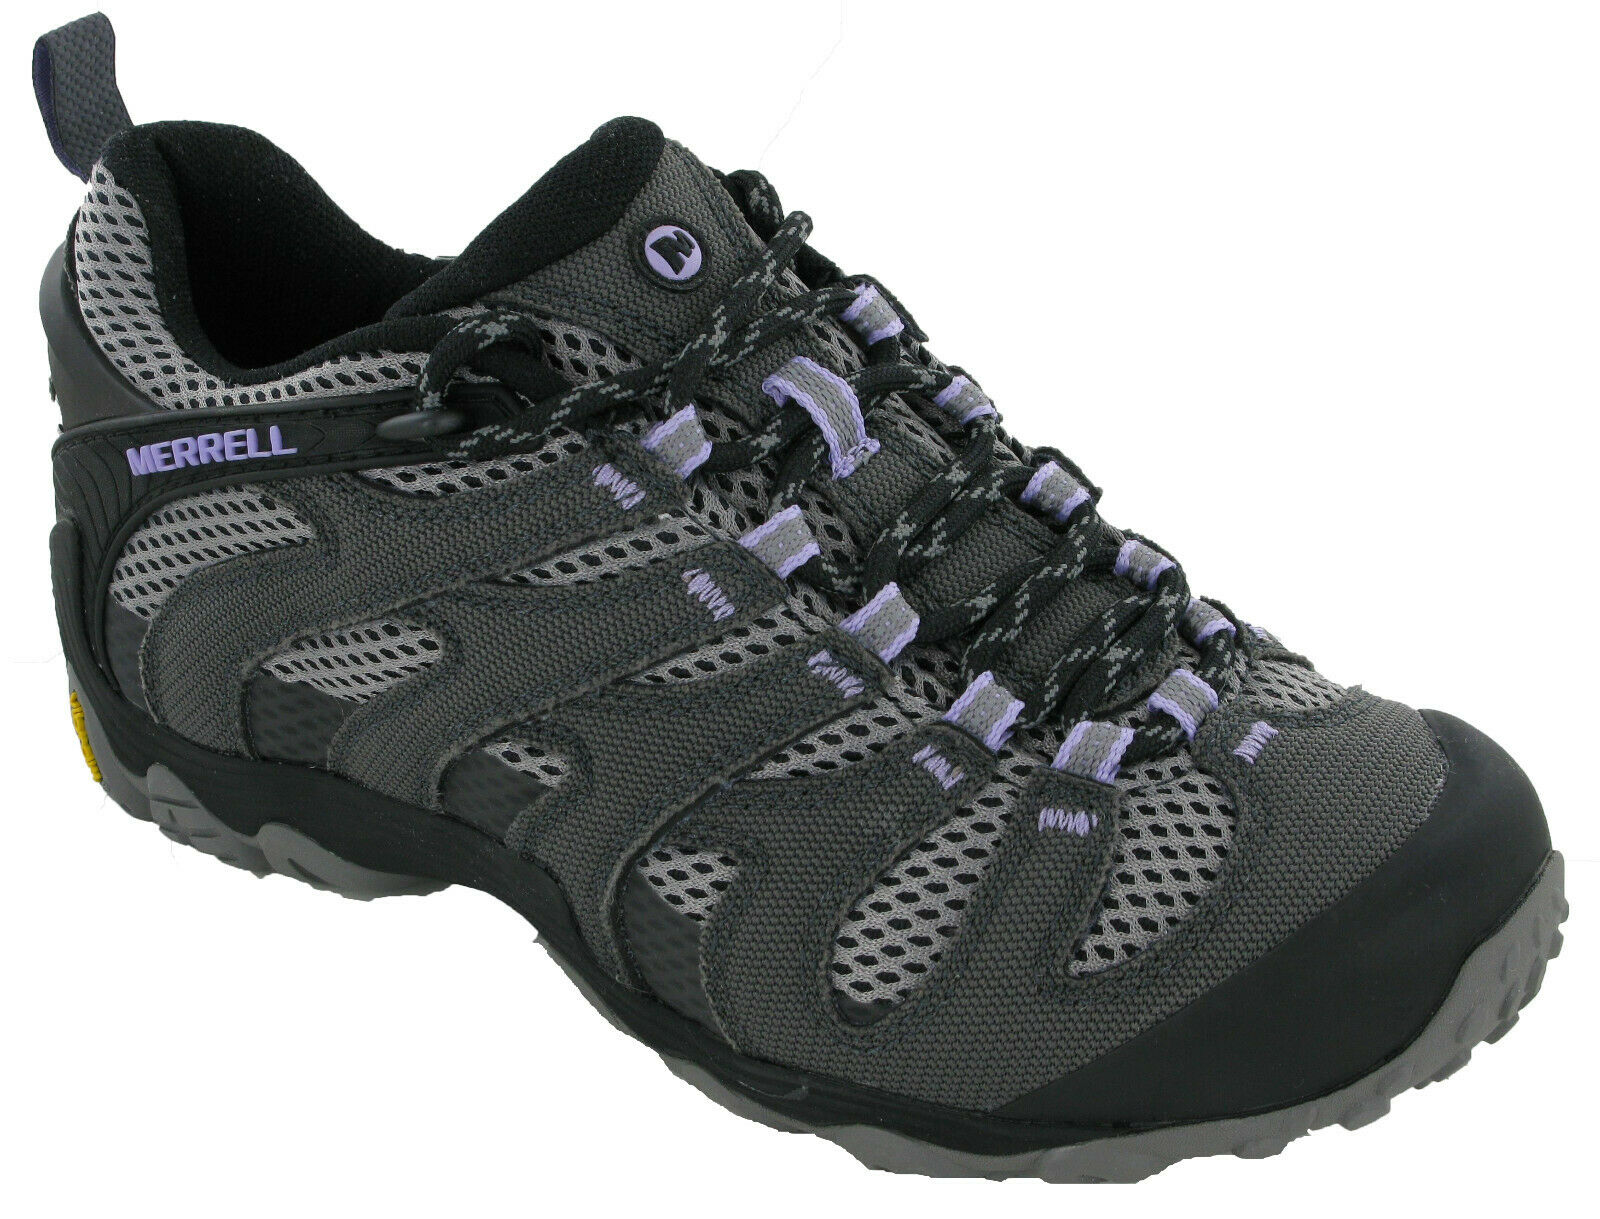 Merrell Cham 7 Zapatillas para mujer tiro bajo con cordones Casual Zapatos al Aire Libre J12076